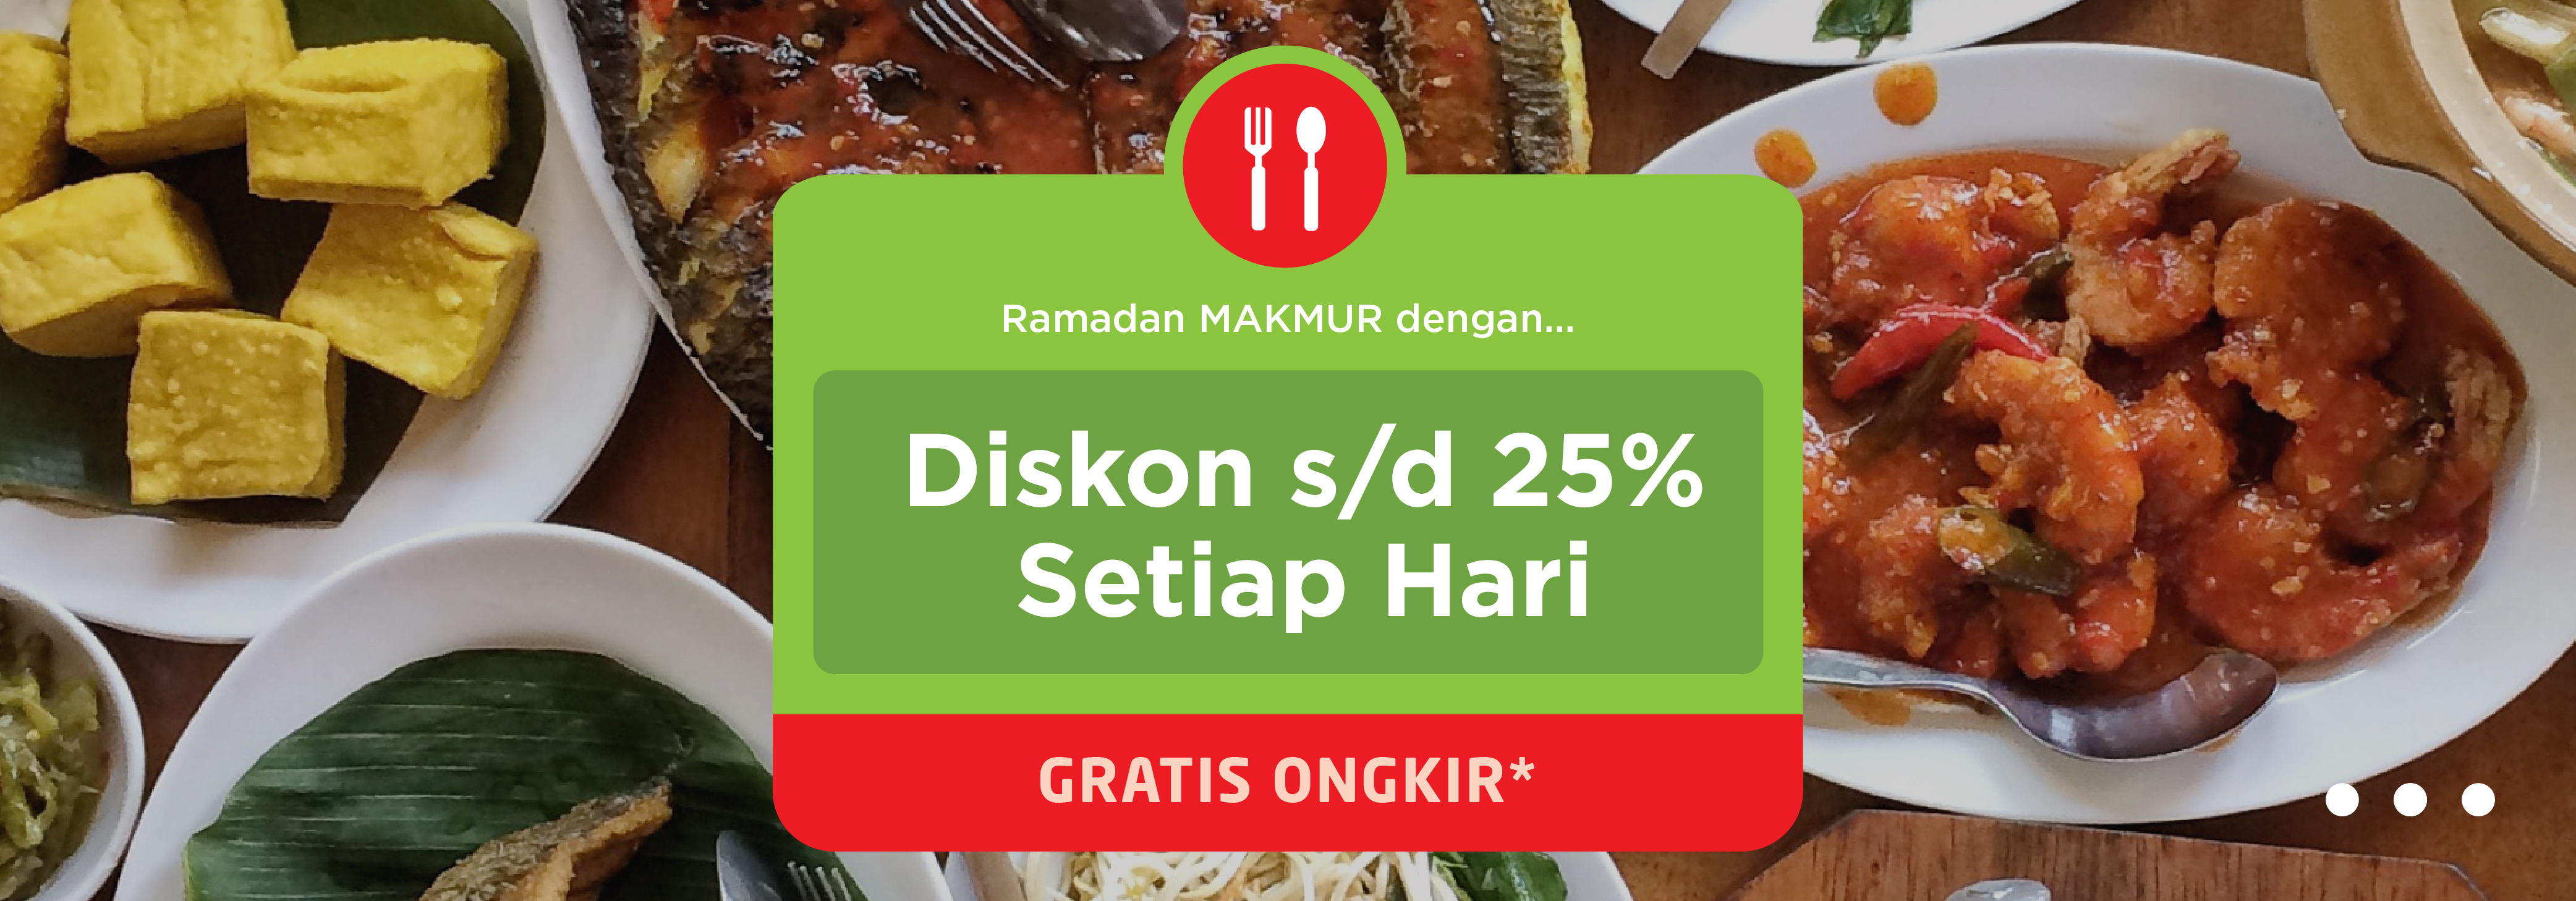 Promo Ramadhan GO-FOOD : Diskon Hingga 25% & Gratis Ongkir